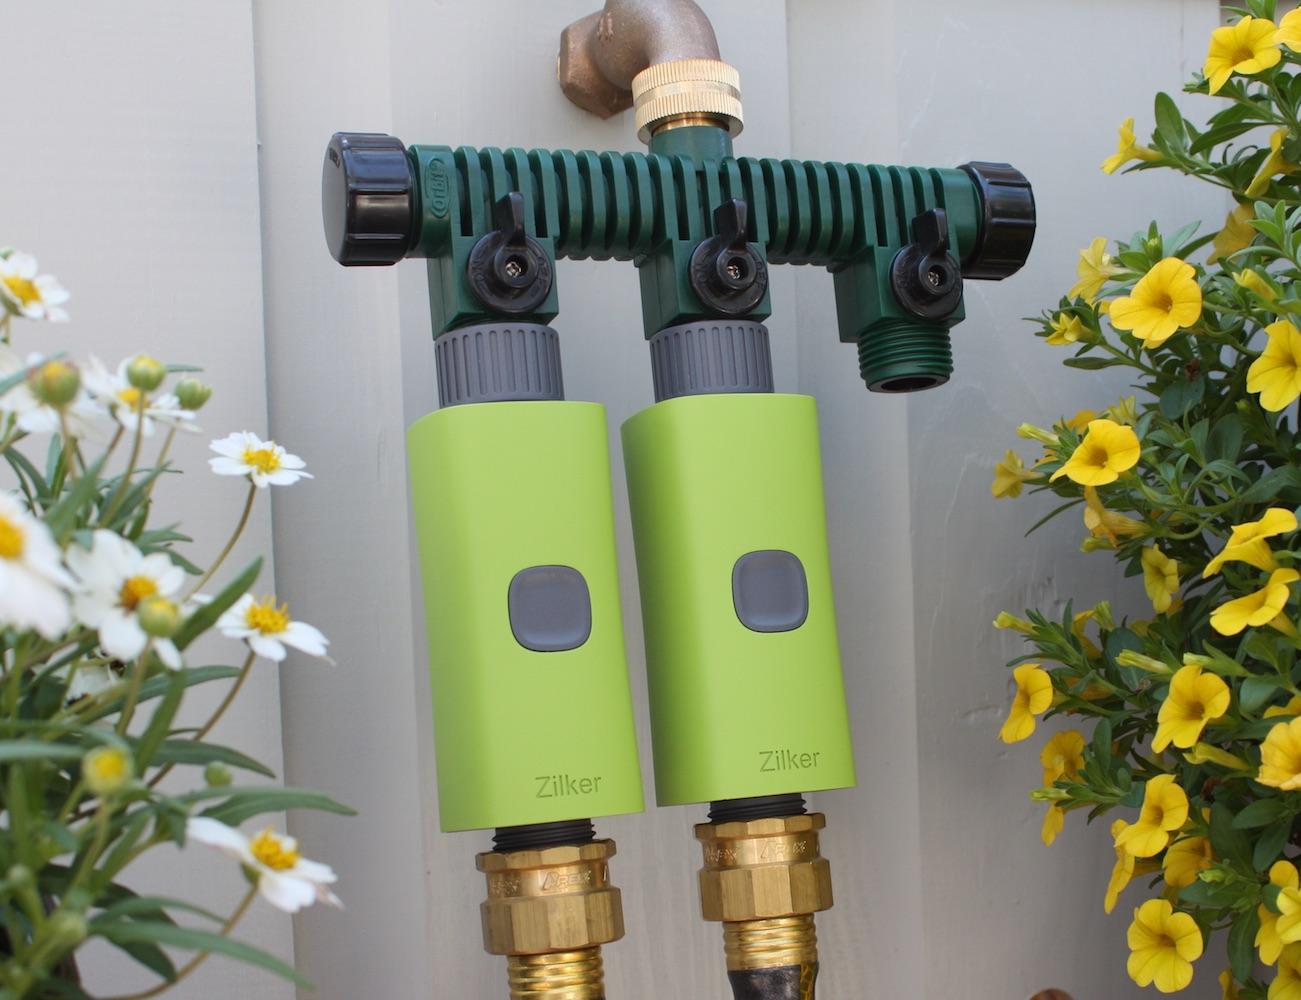 Zilker Intelligent Irrigation Device